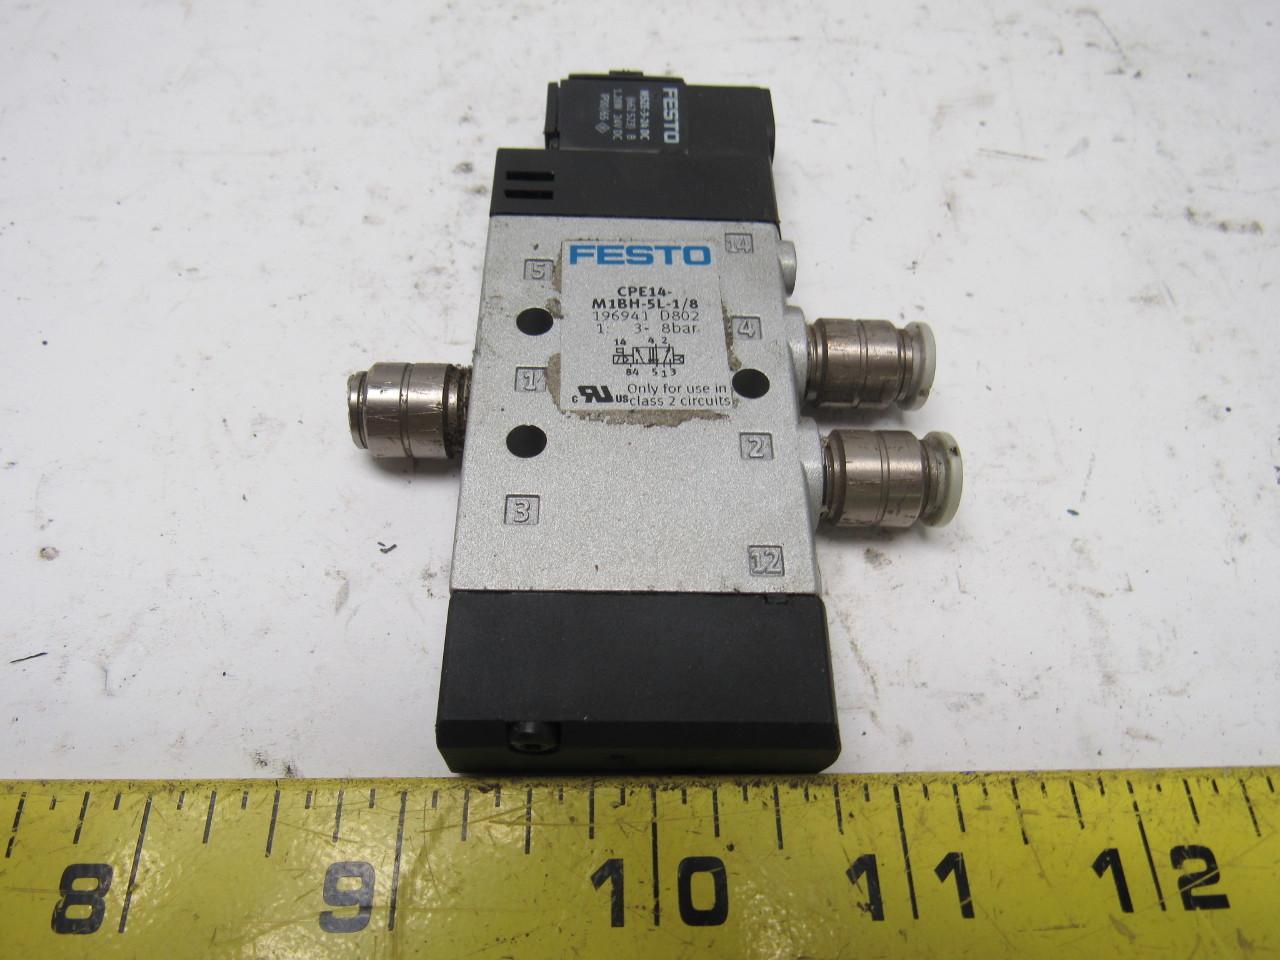 festo pneumatic valves festo cpe14 m1bh 5l 1 8 pneumatic directional control valve 24vdc